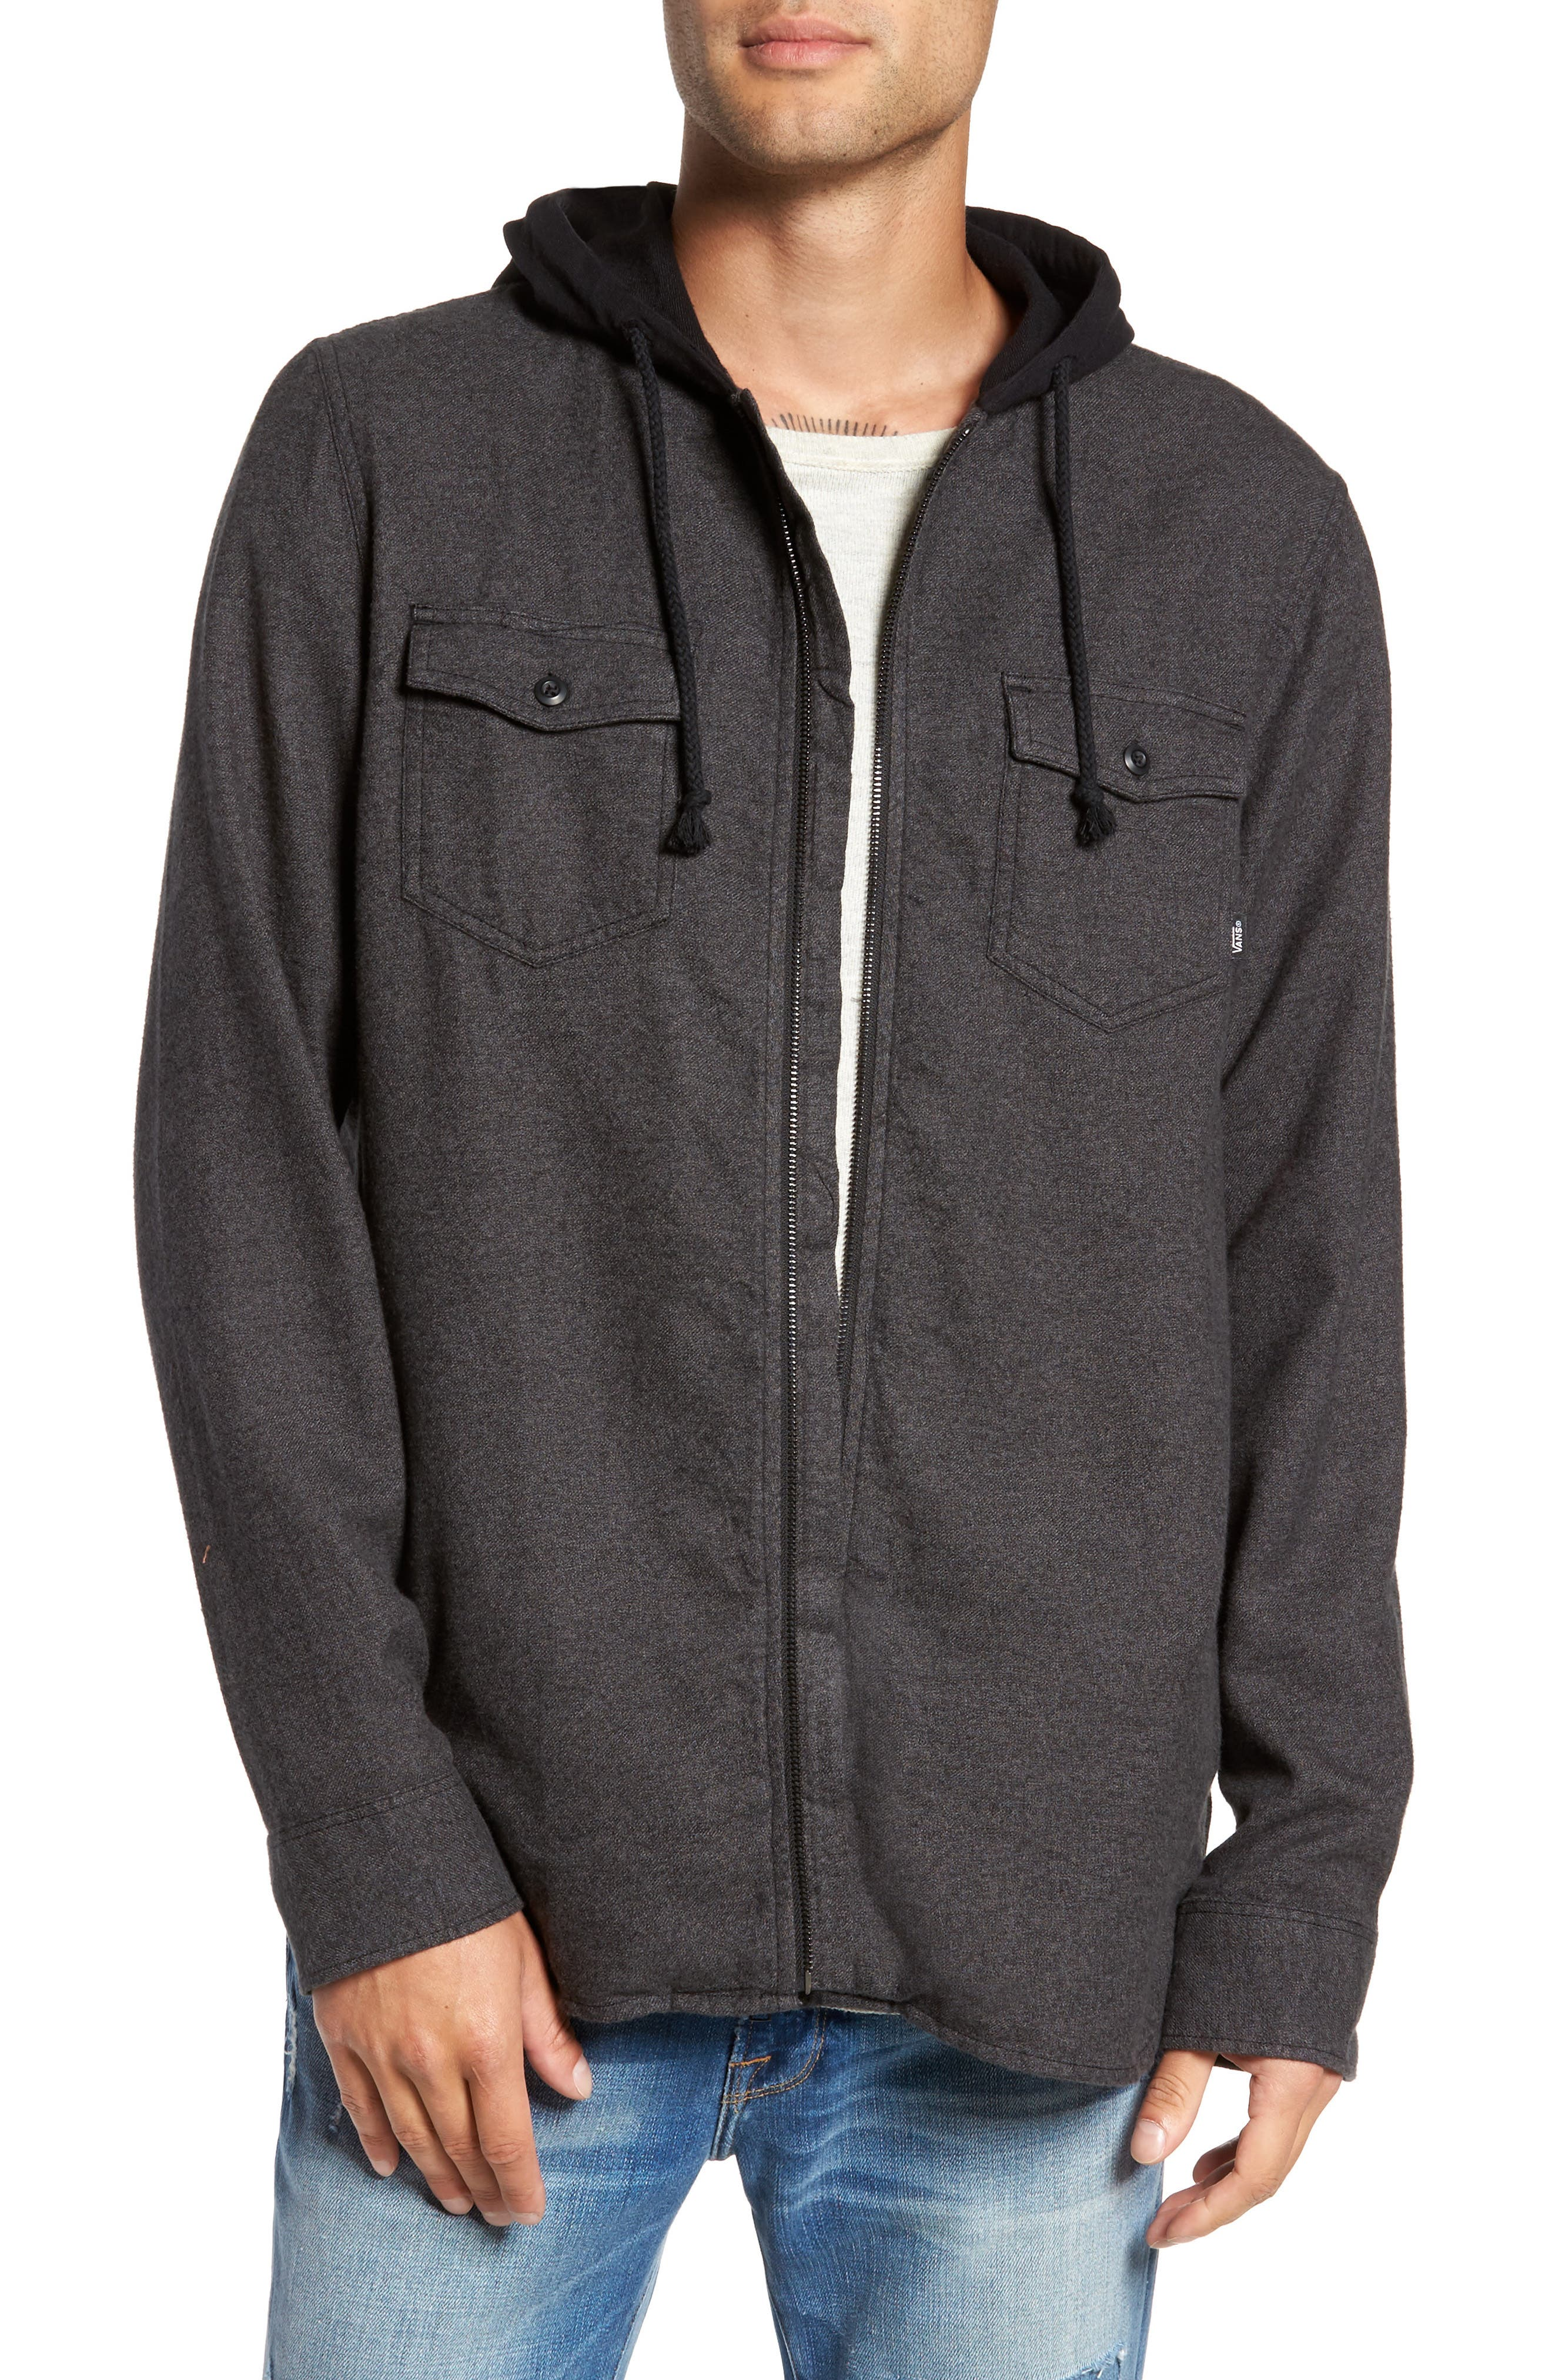 Main Image - Vans Never Mind Hooded Zip Shirt Jacket